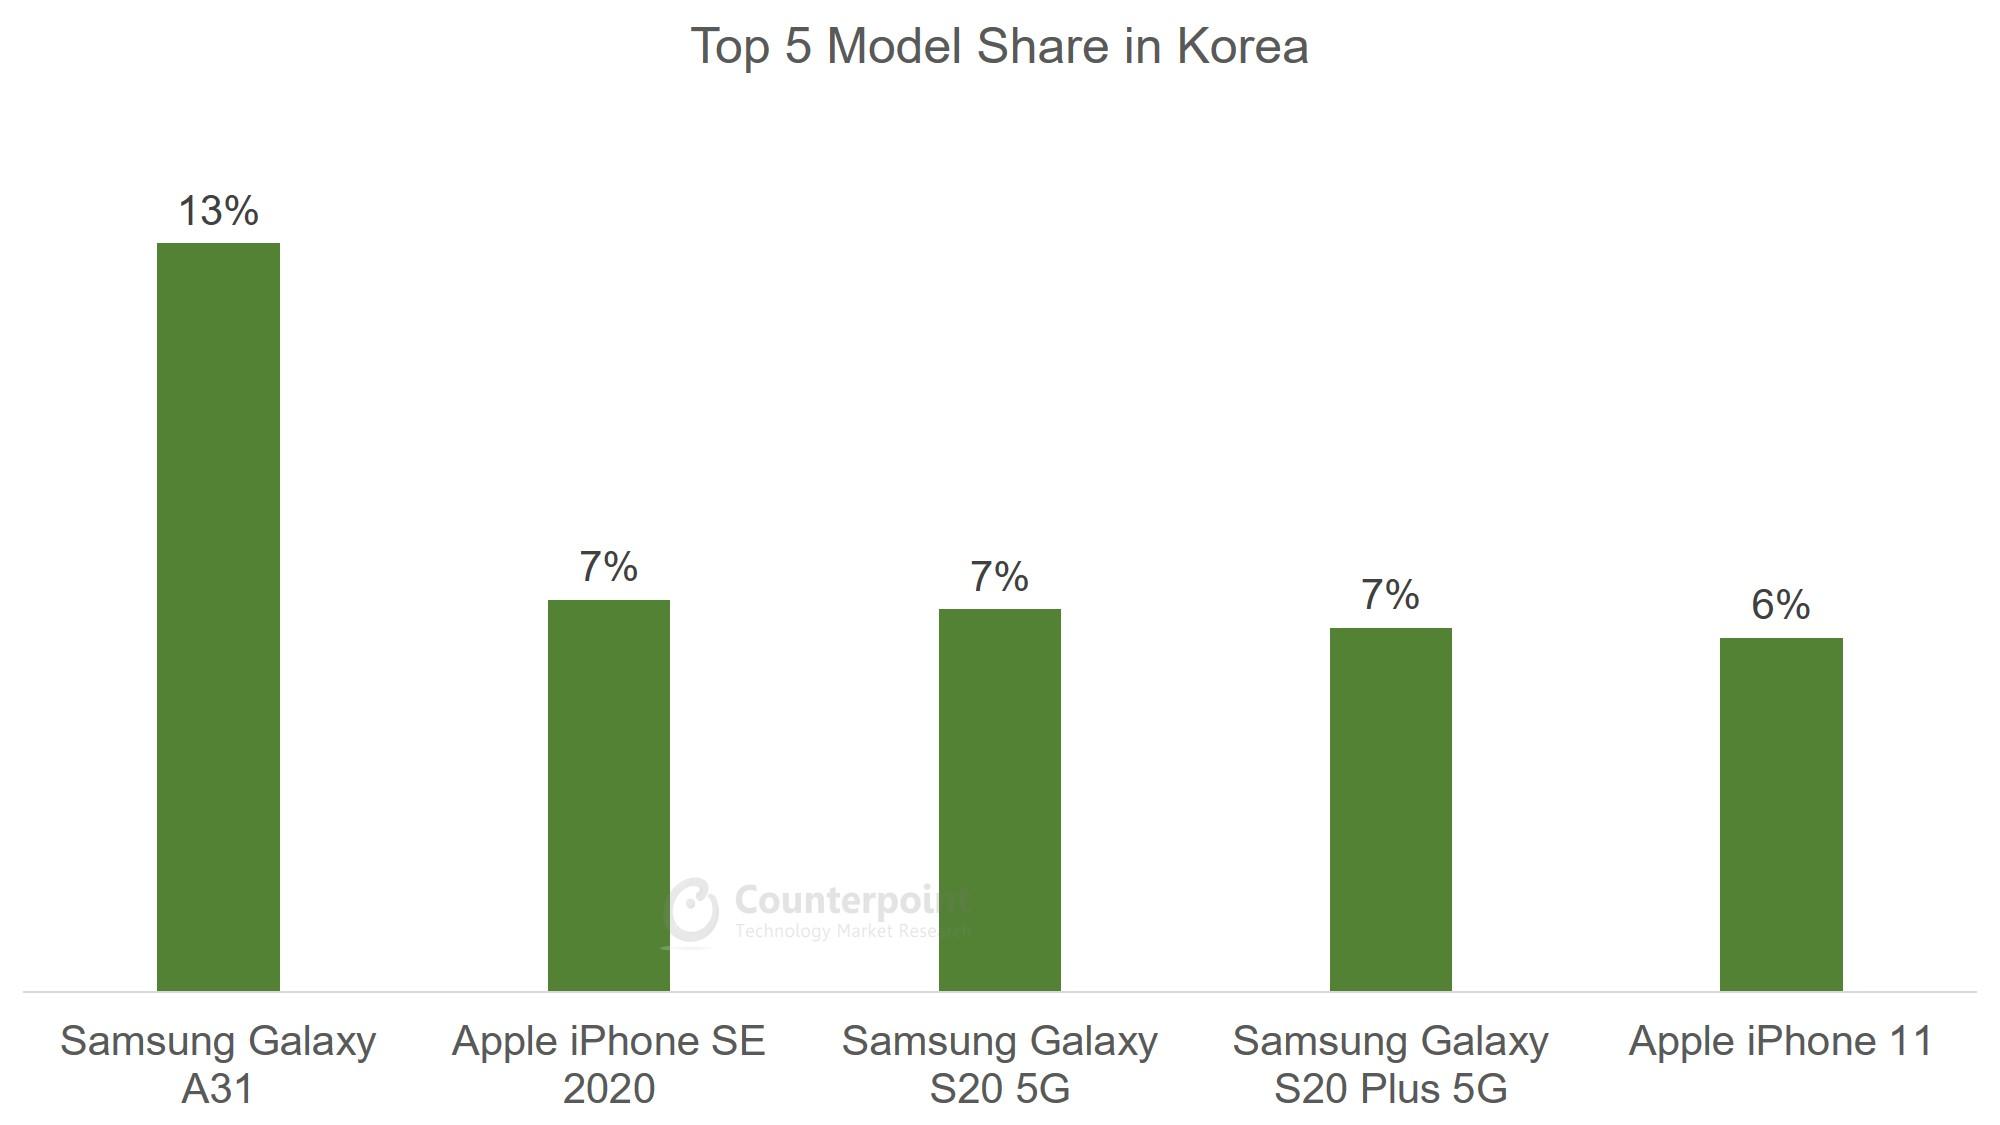 South Korea - Top 5 Model Share - Jul 2020